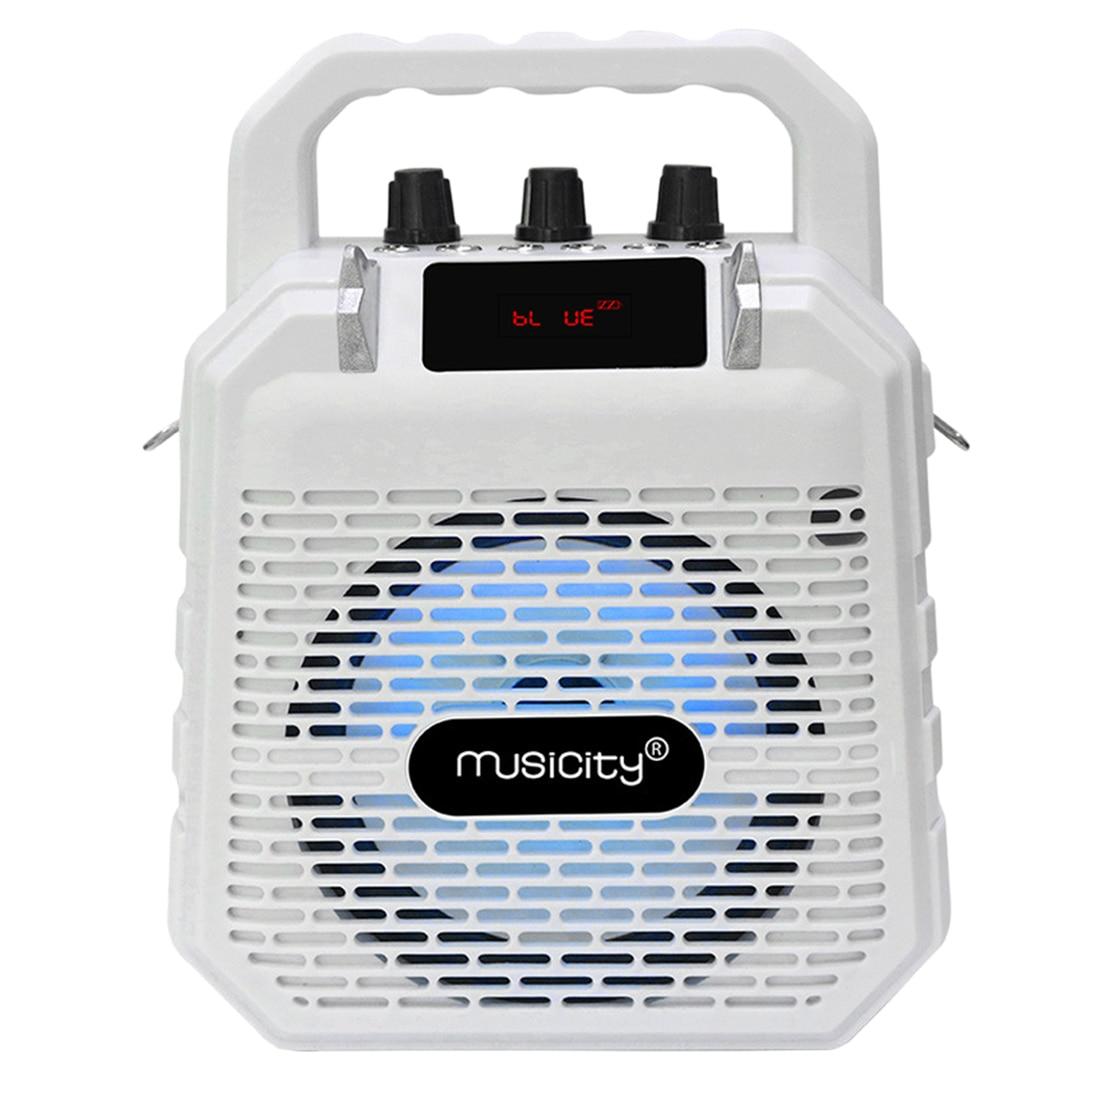 Altavoz Bluetooth portátil para niños altavoz inalámbrico Mini Karaoke máquina de juguete instrumento Musical blanco